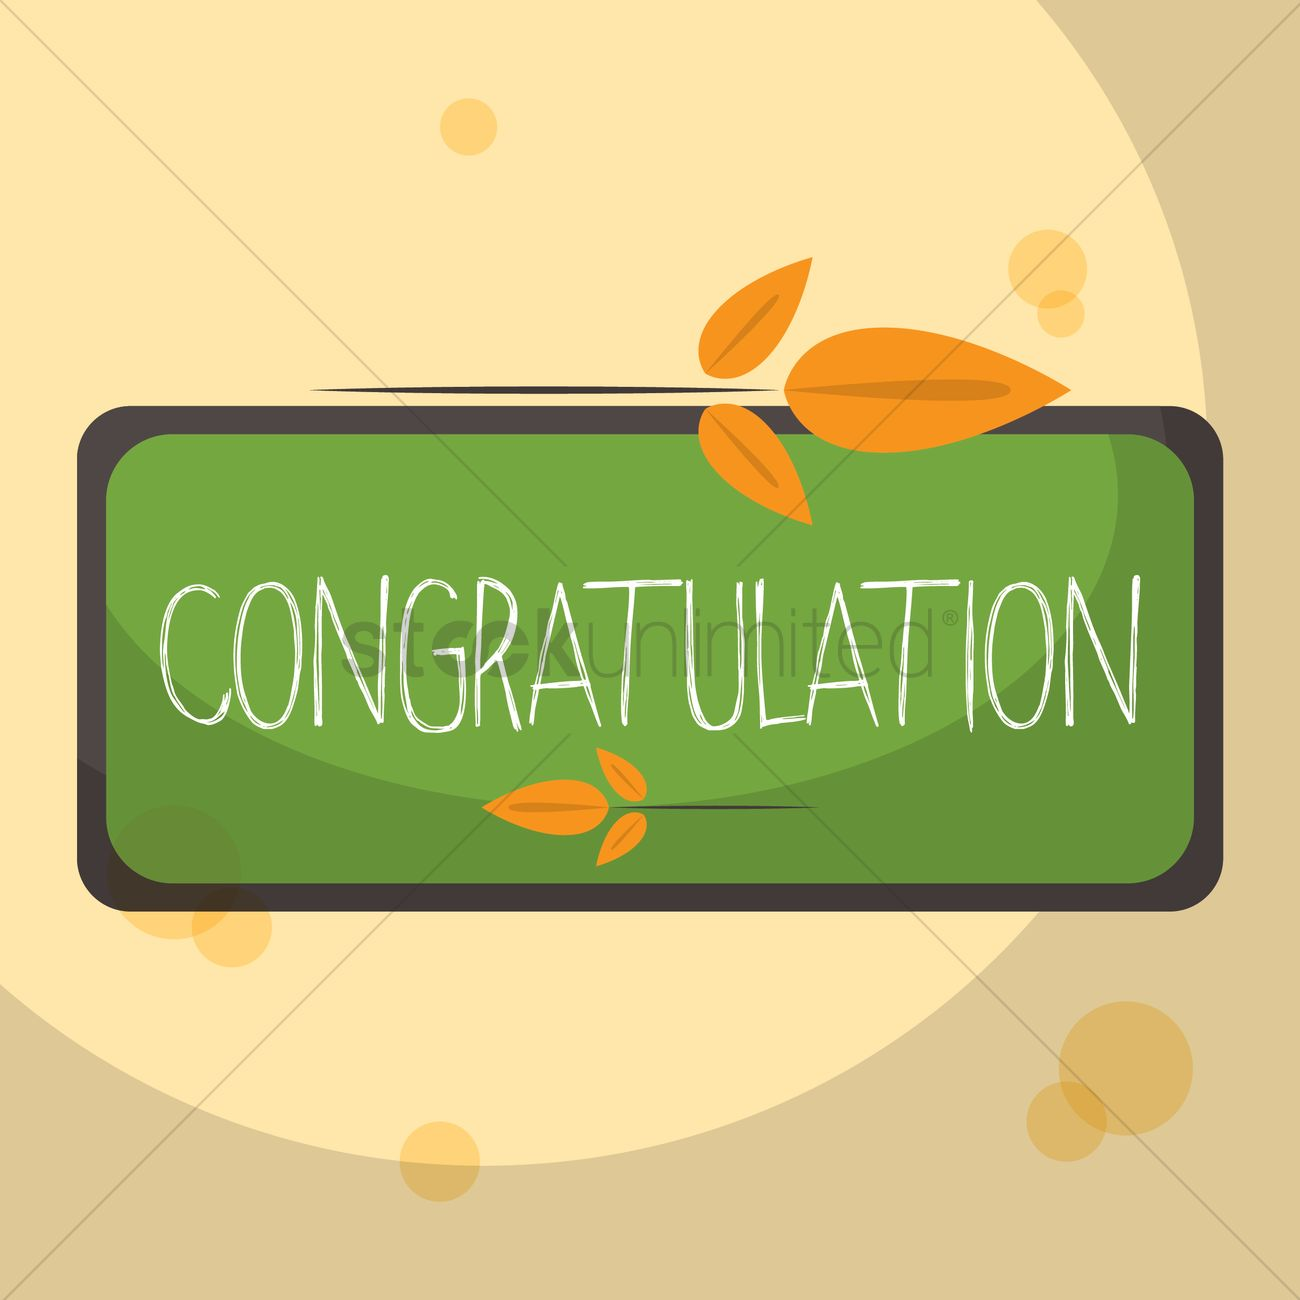 1300x1300 Congratulation Greeting Vector Image